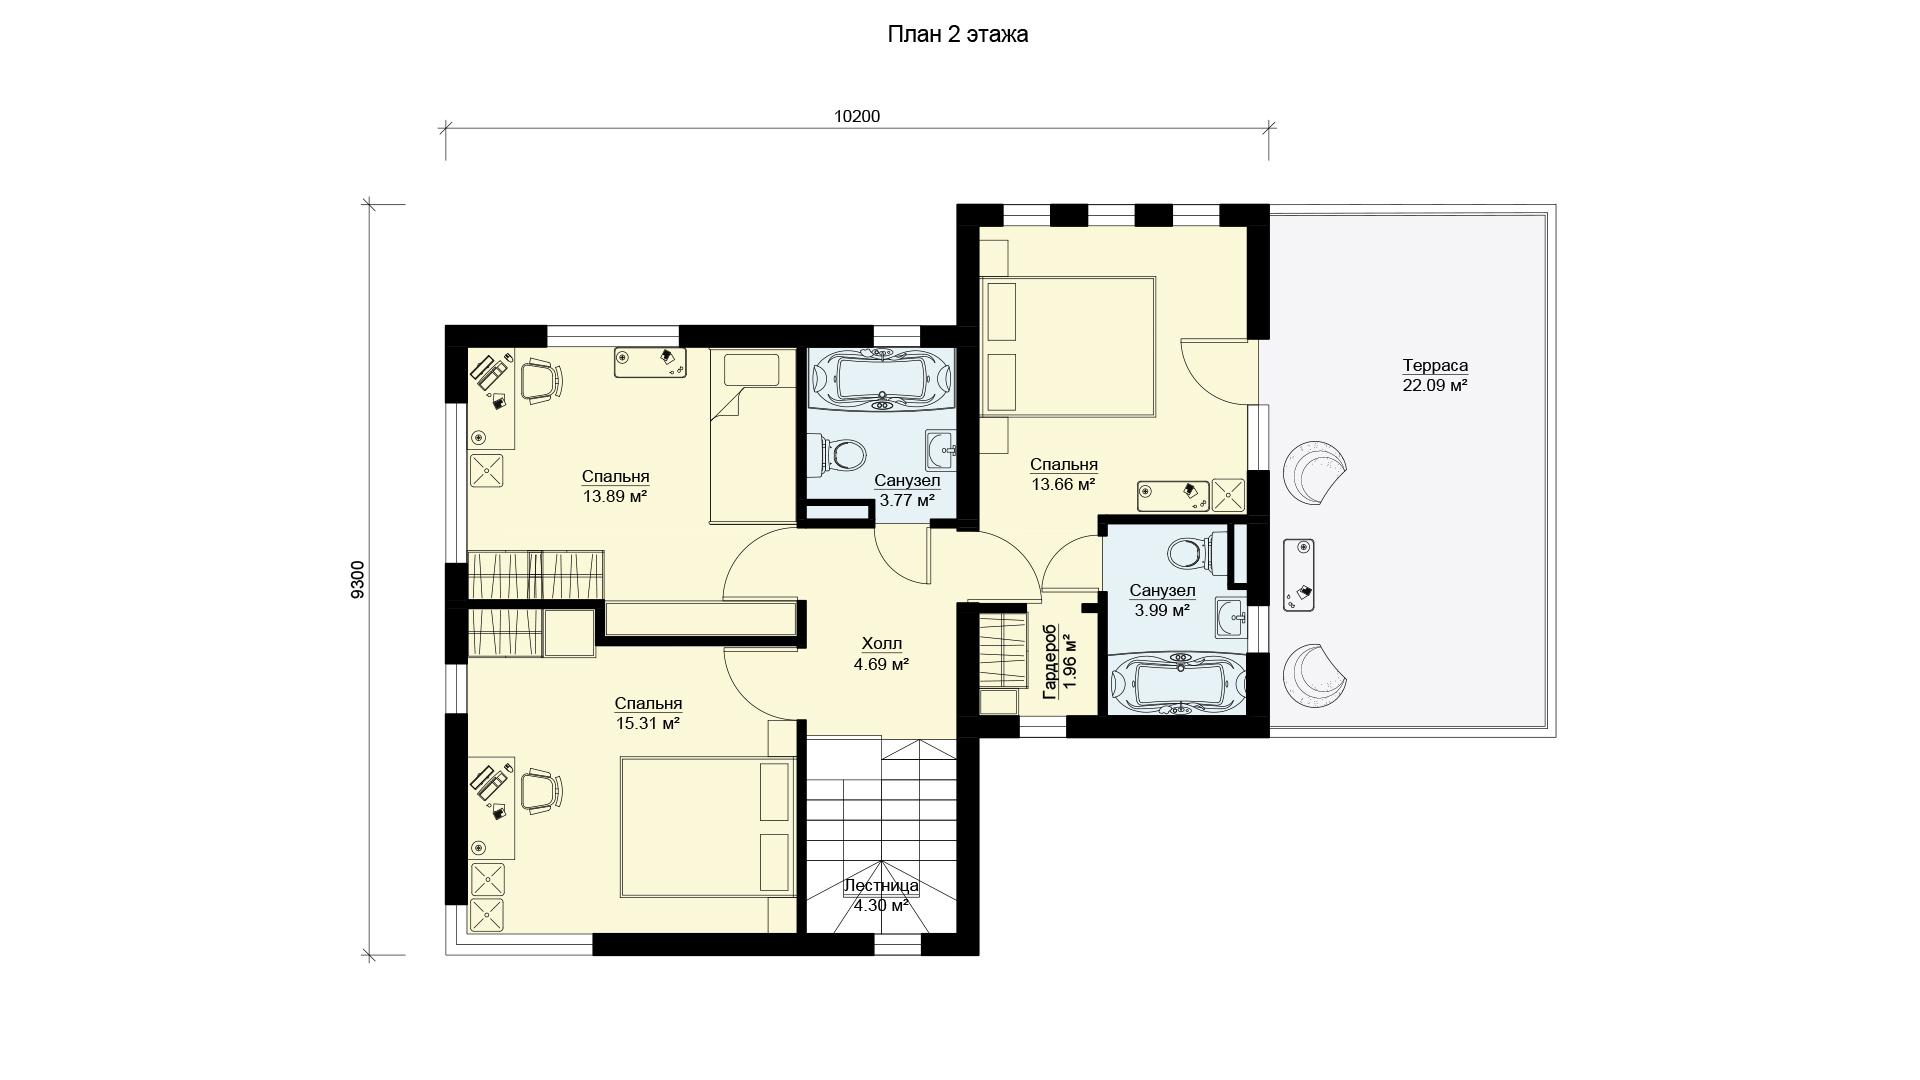 План второго этажа двухэтажного дома БЭНПАН, проект МС-224.